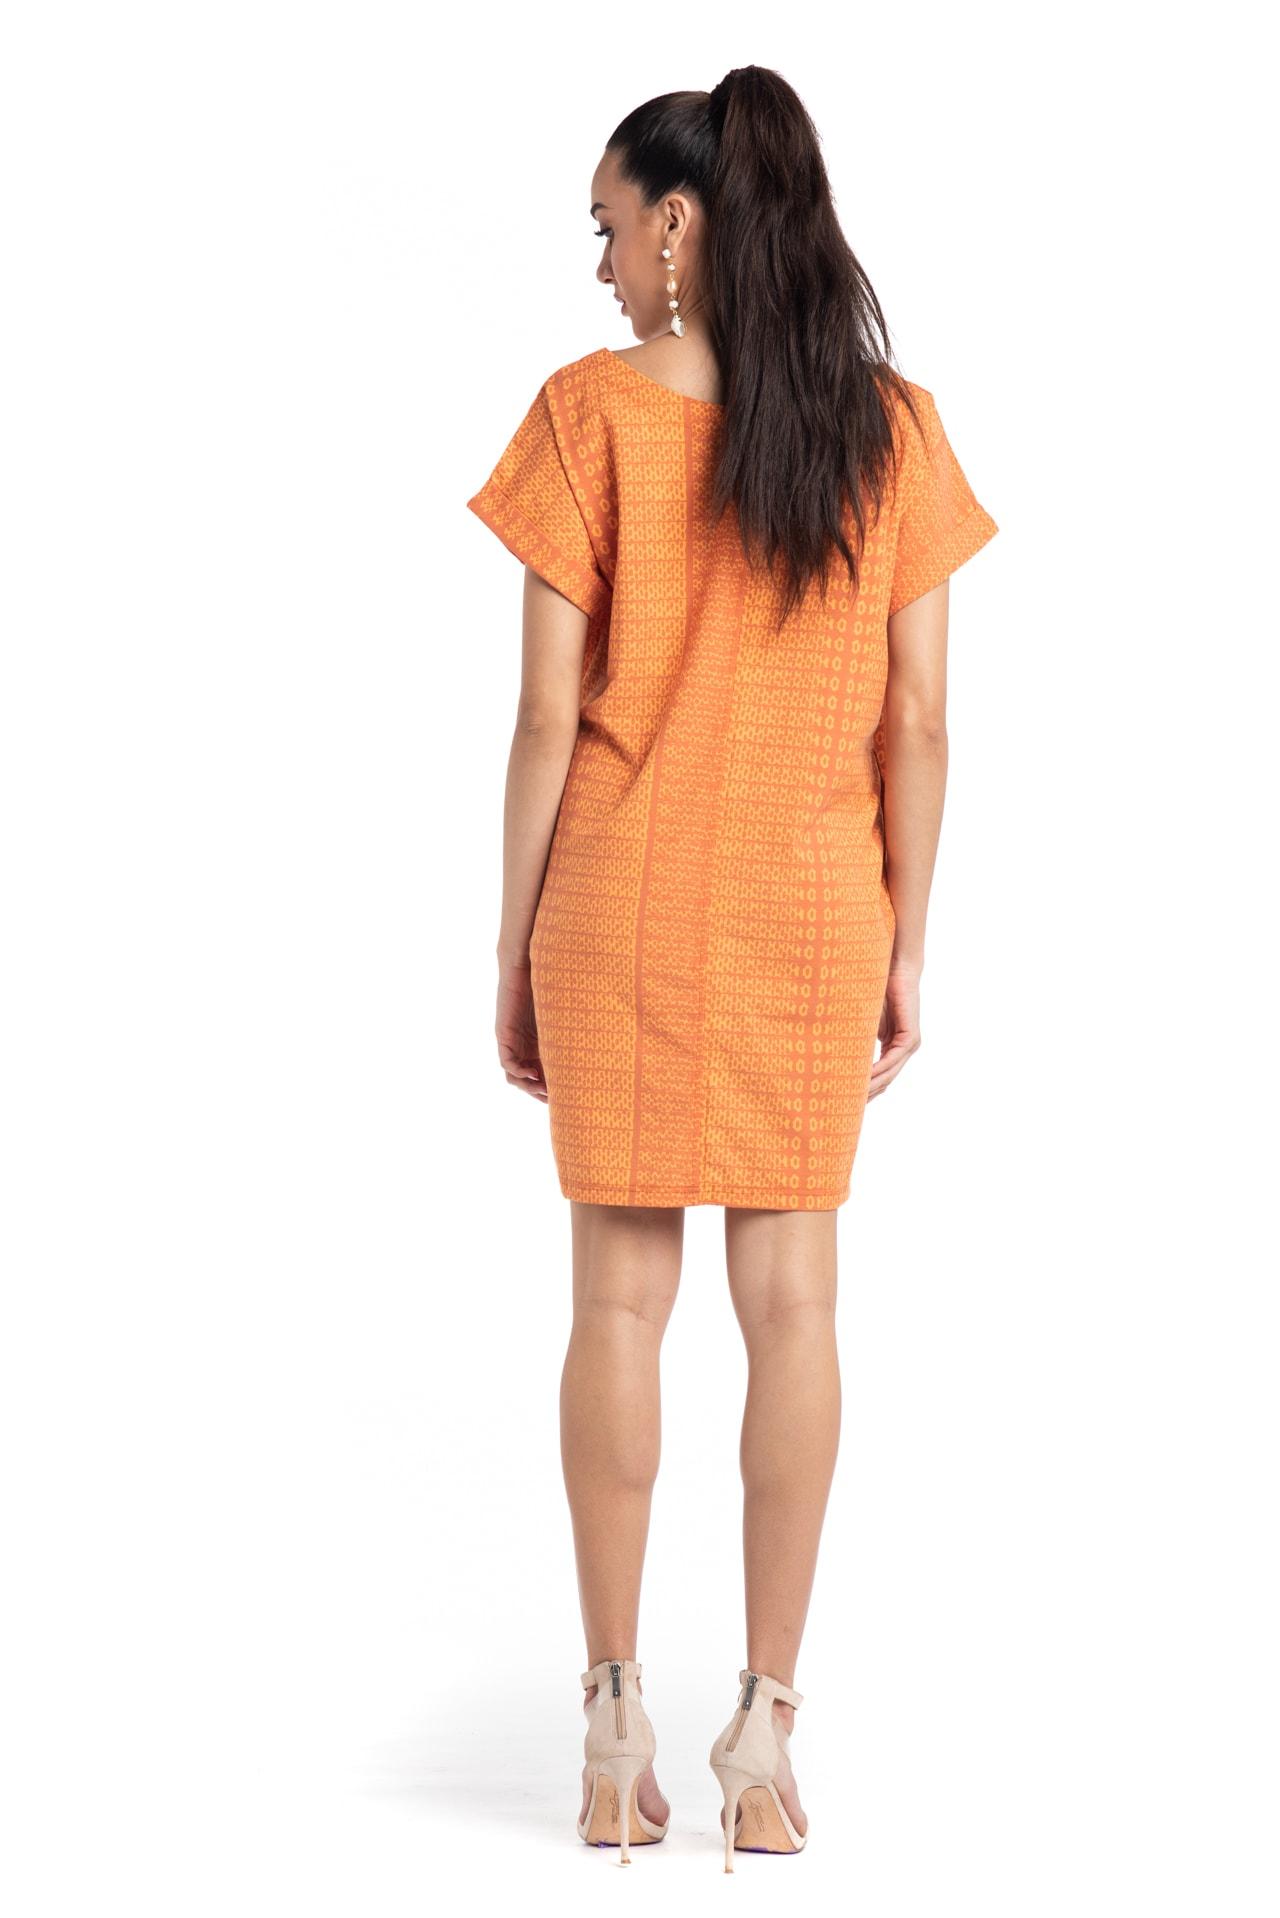 Model wearing Puaniu Shift Dress in Orange AkoaAkoa - Back View